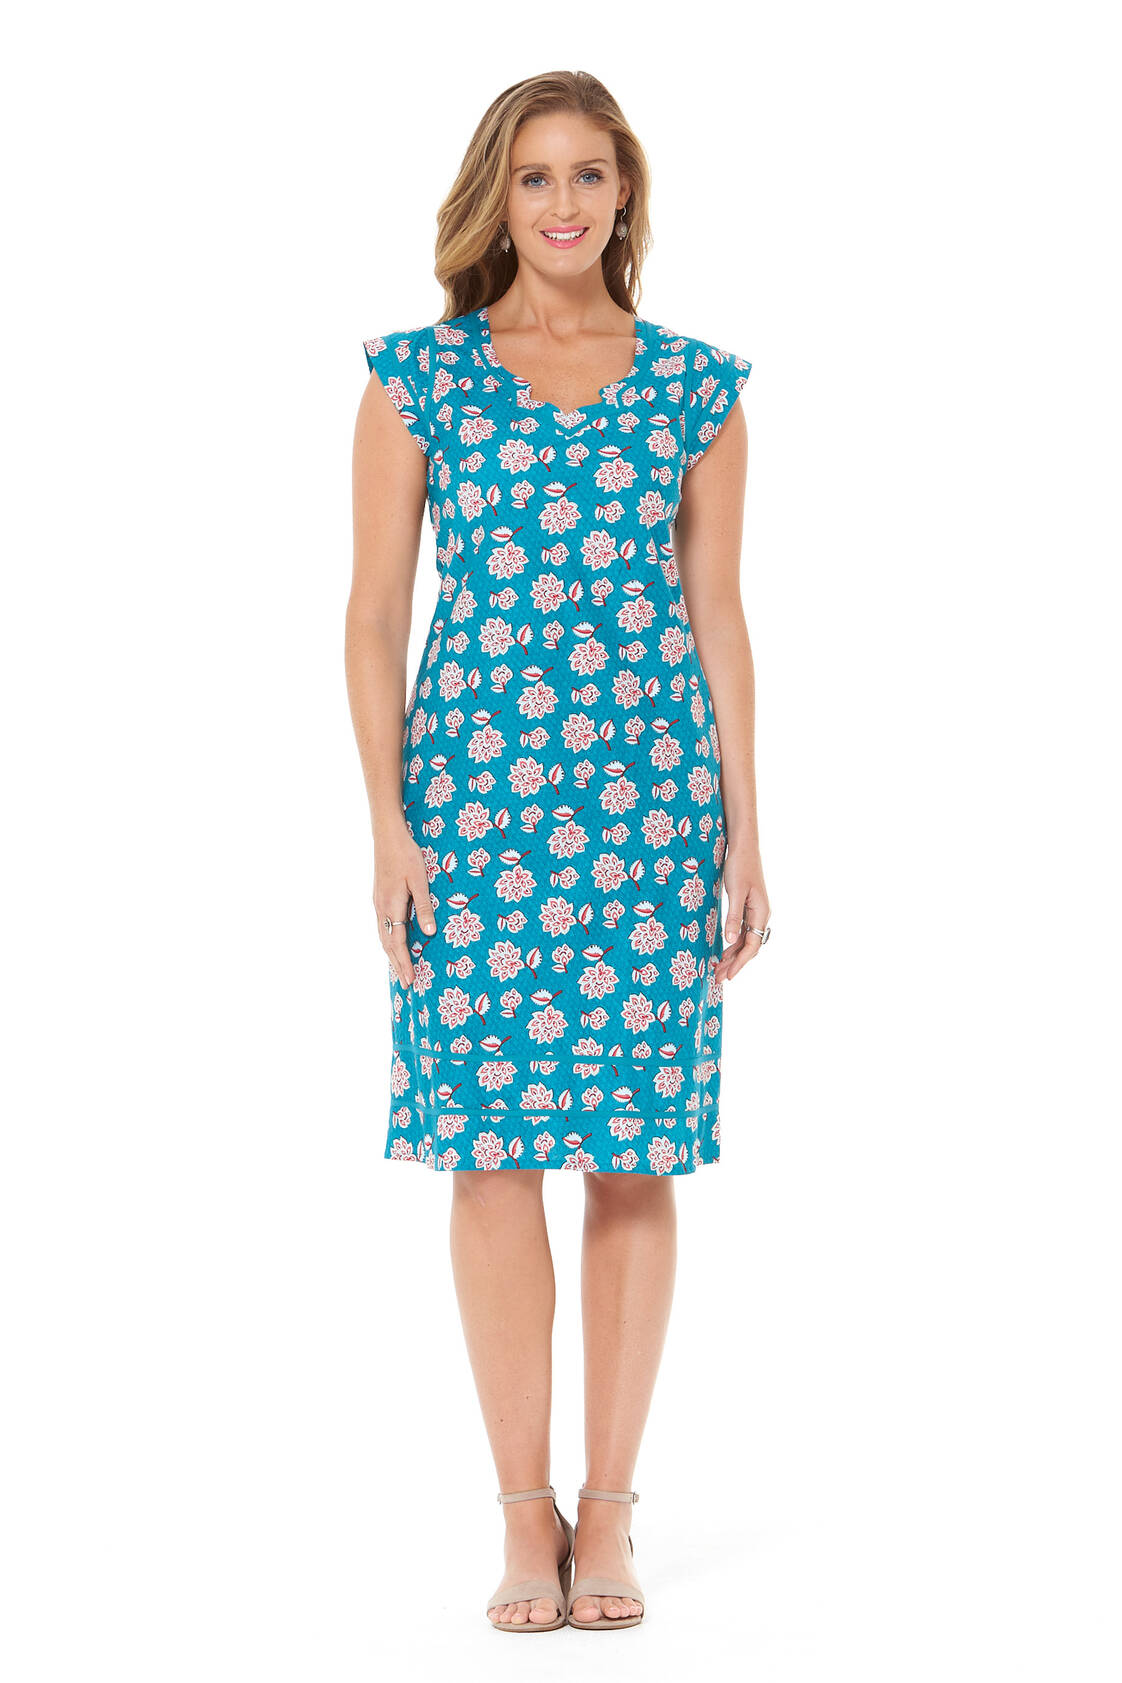 Cassy Cotton Braid Dress - Yoko Print